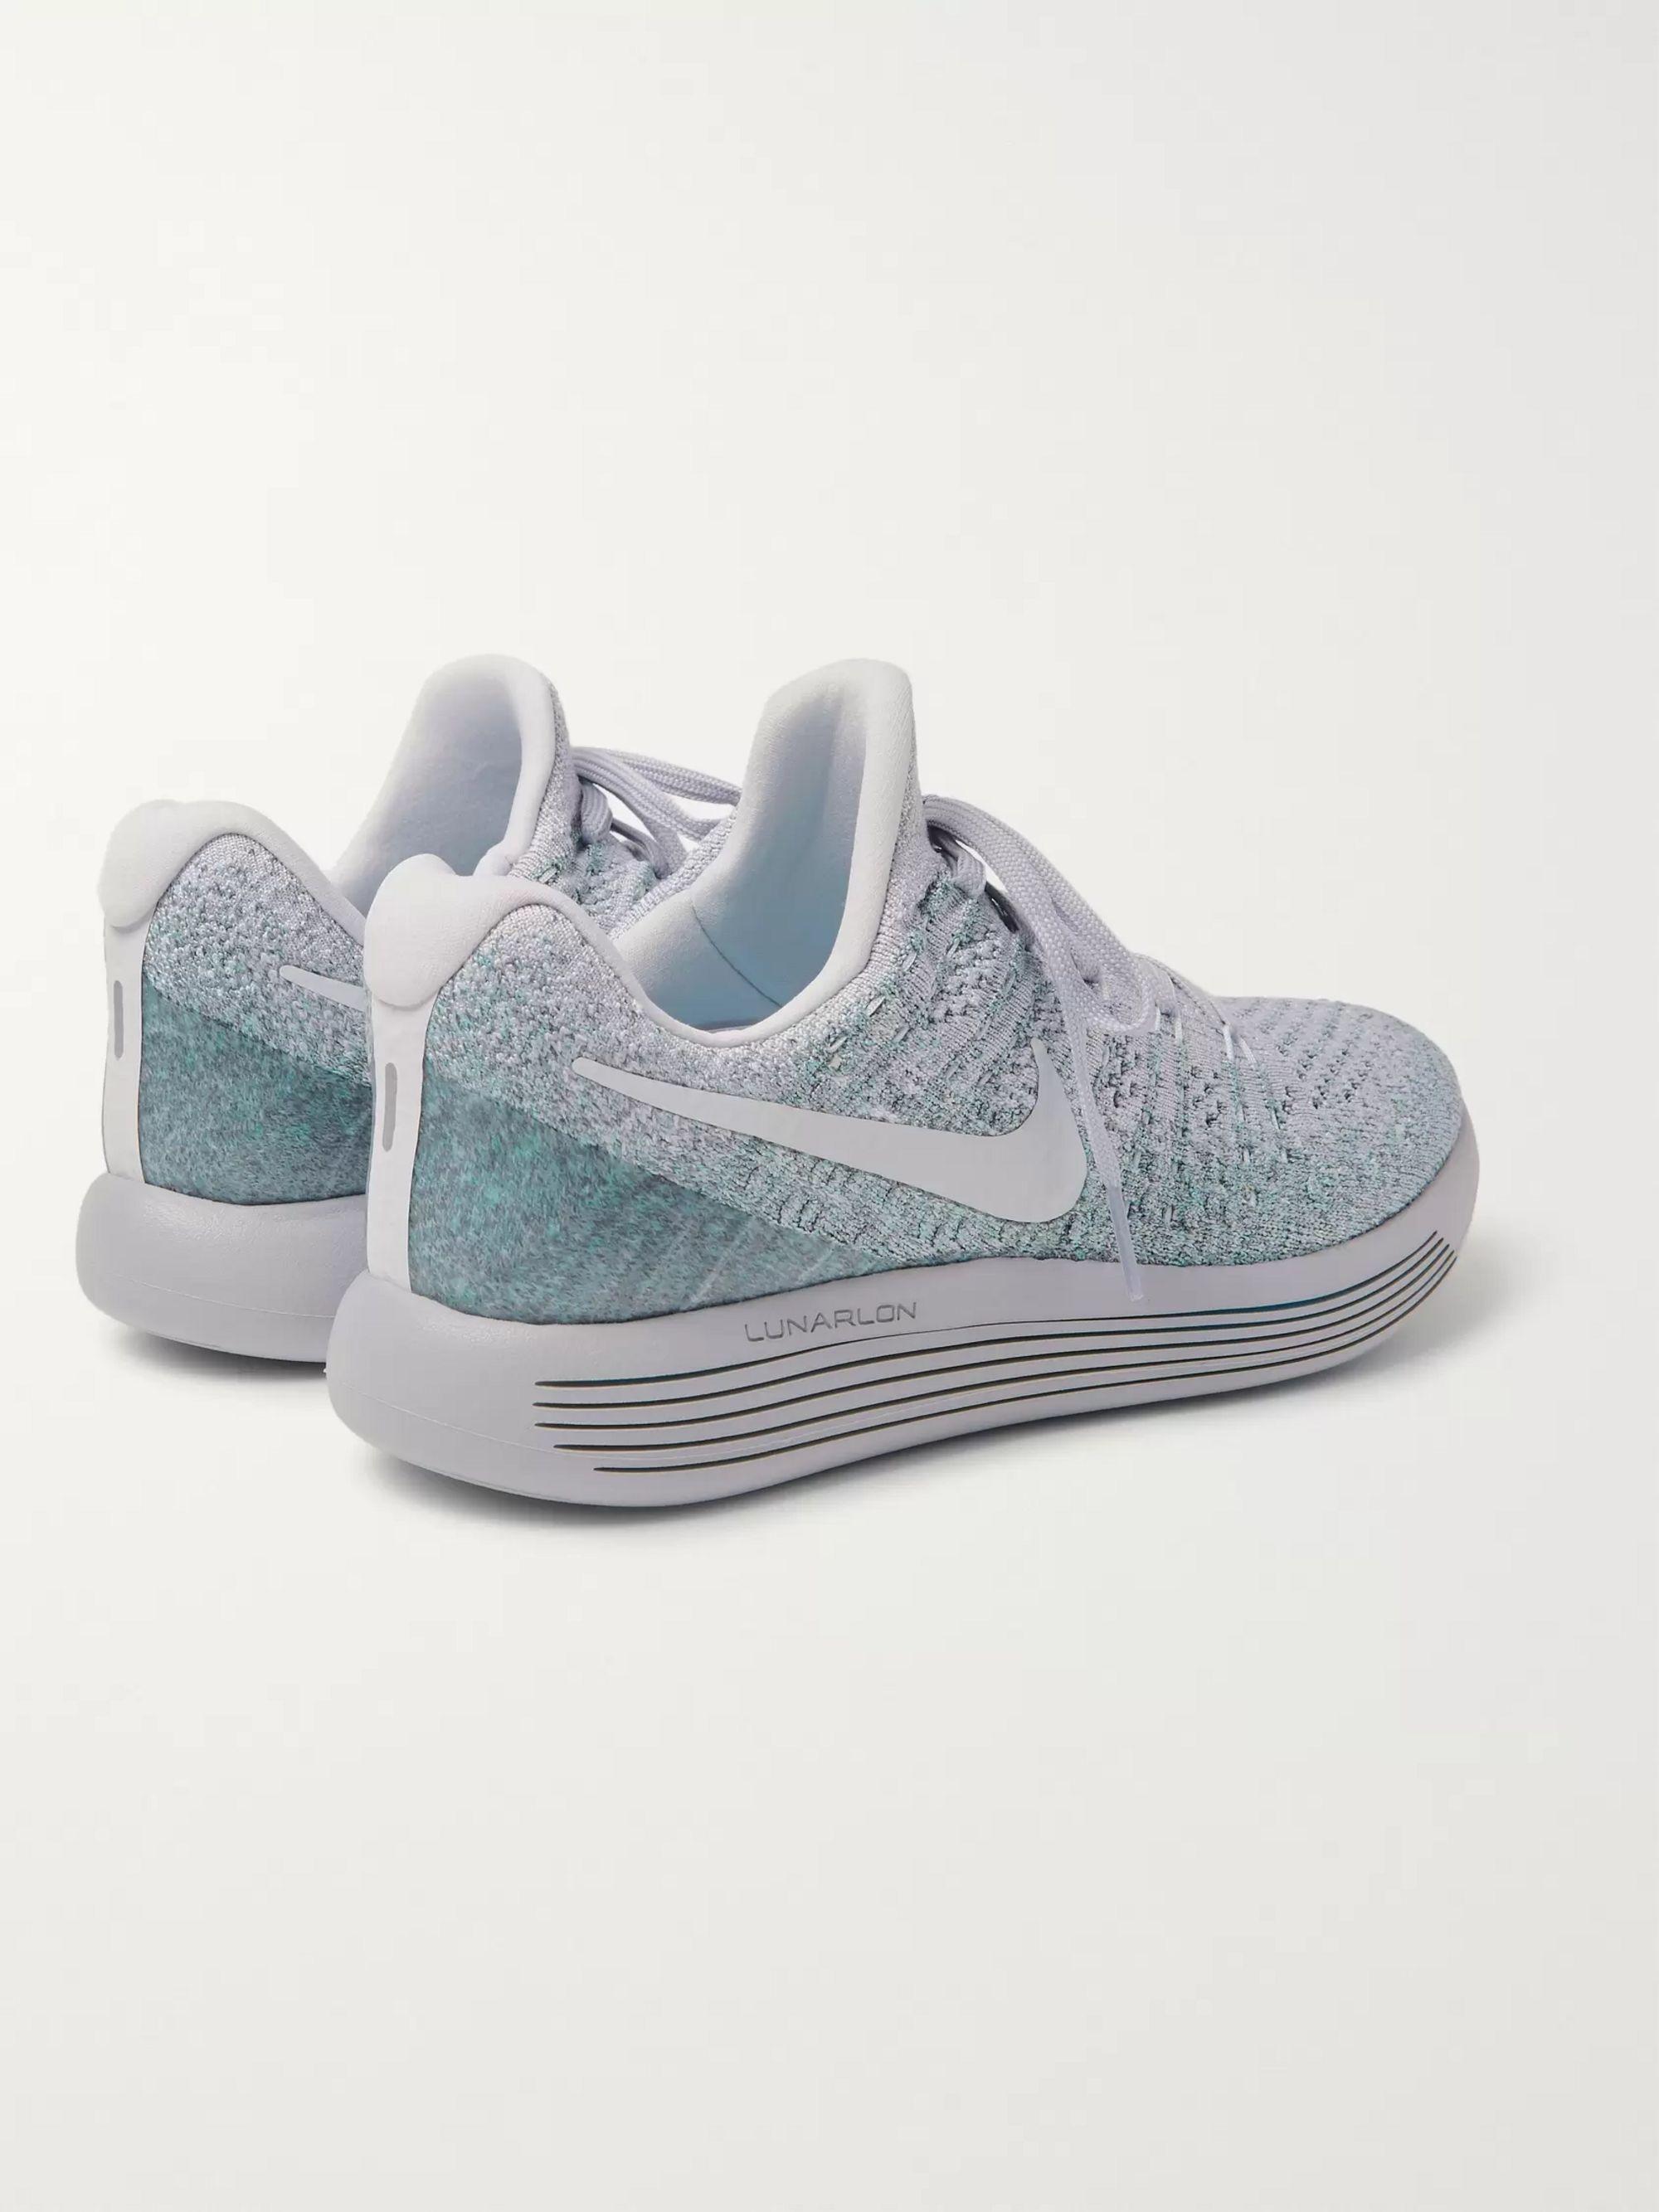 Nike LunarEpic Low Flyknit 2 Women's | Runner's World